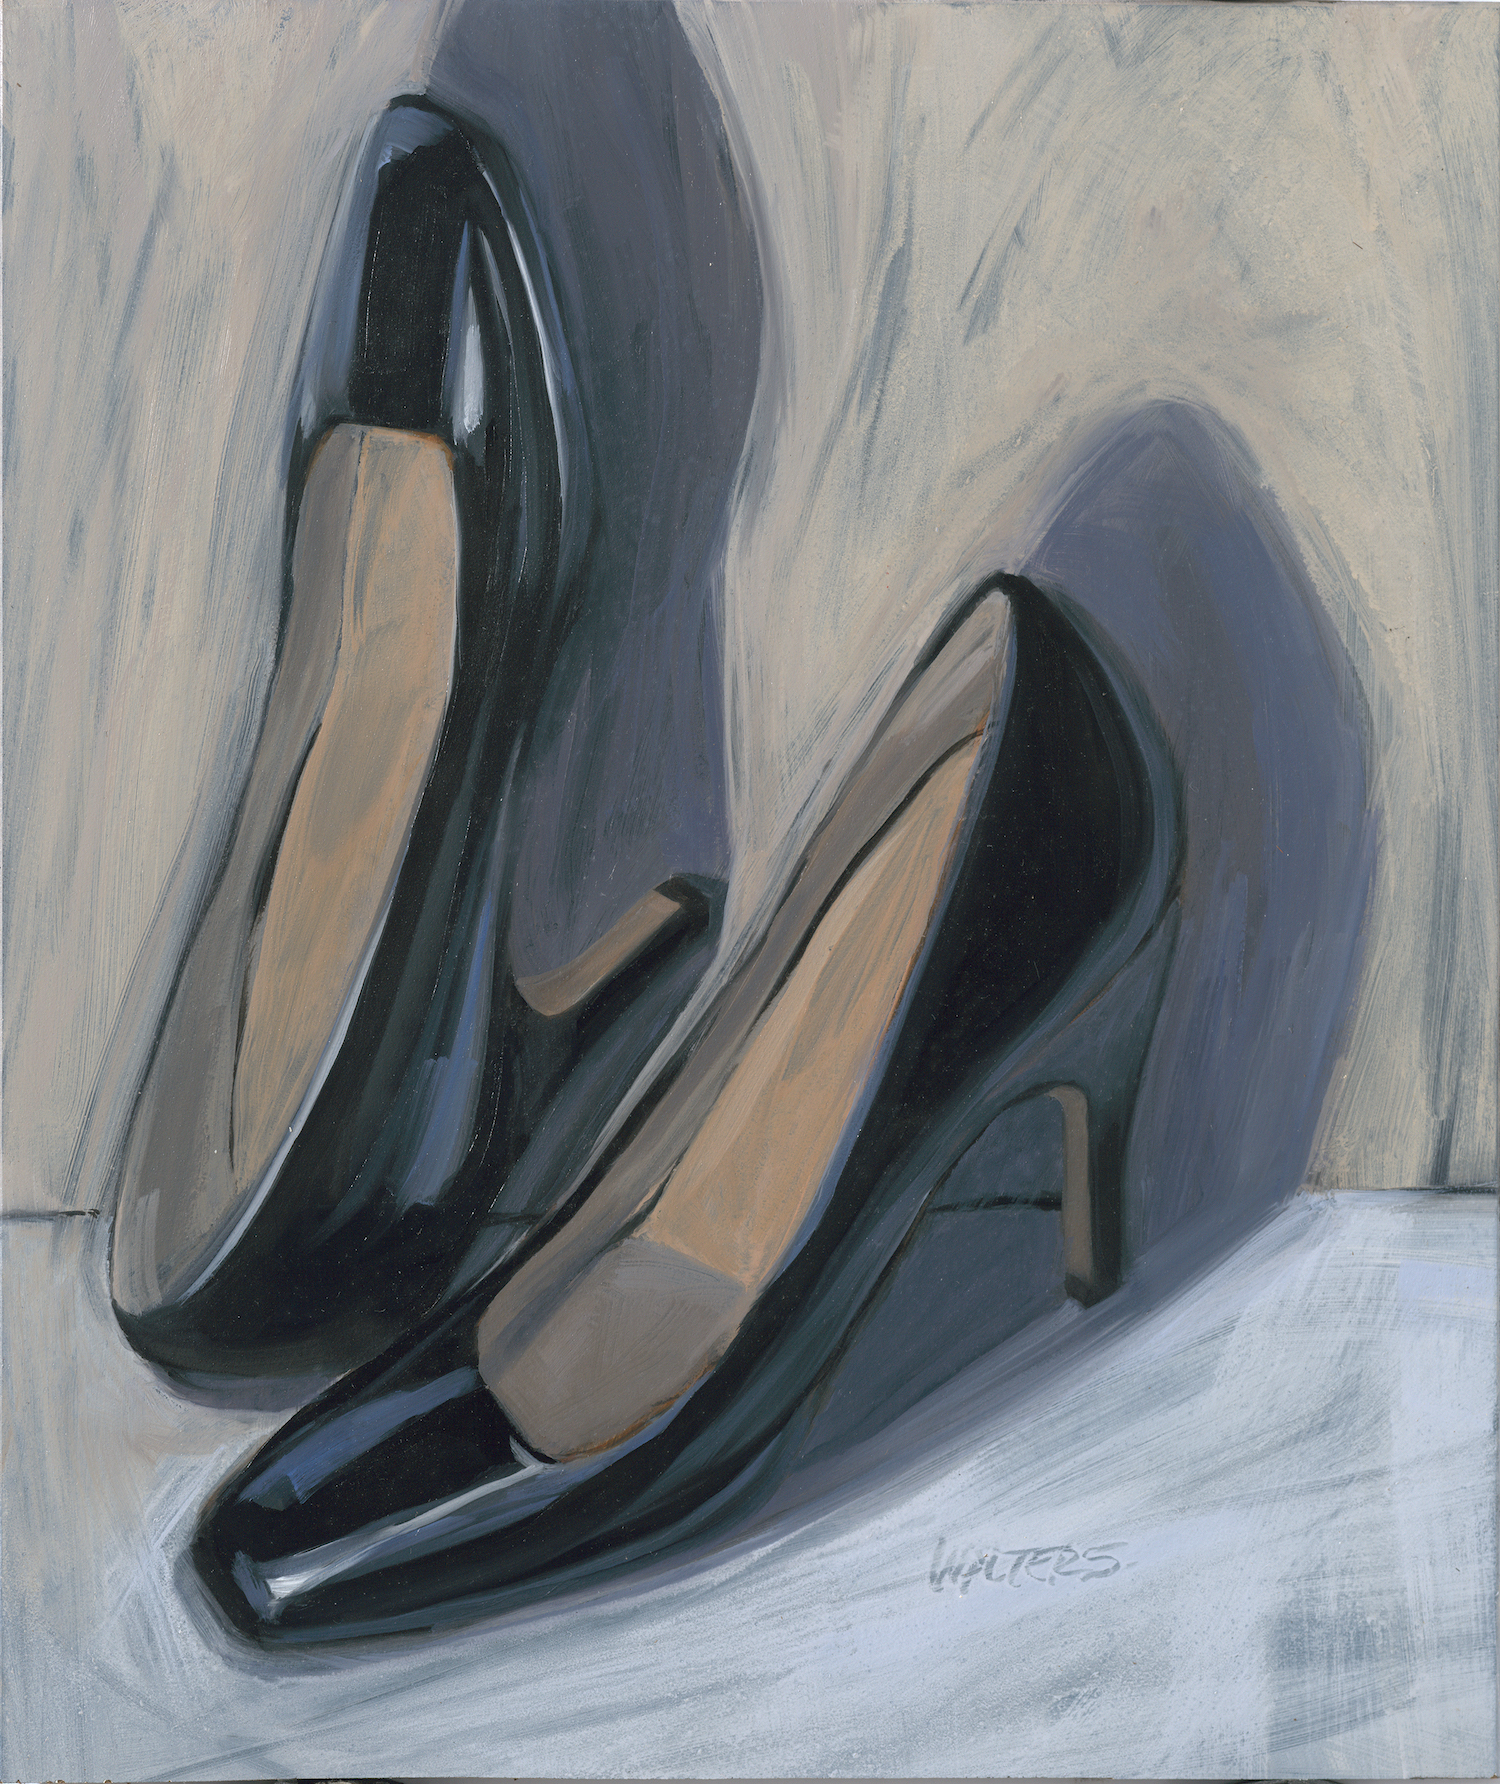 Dancing Shoes med res.jpg